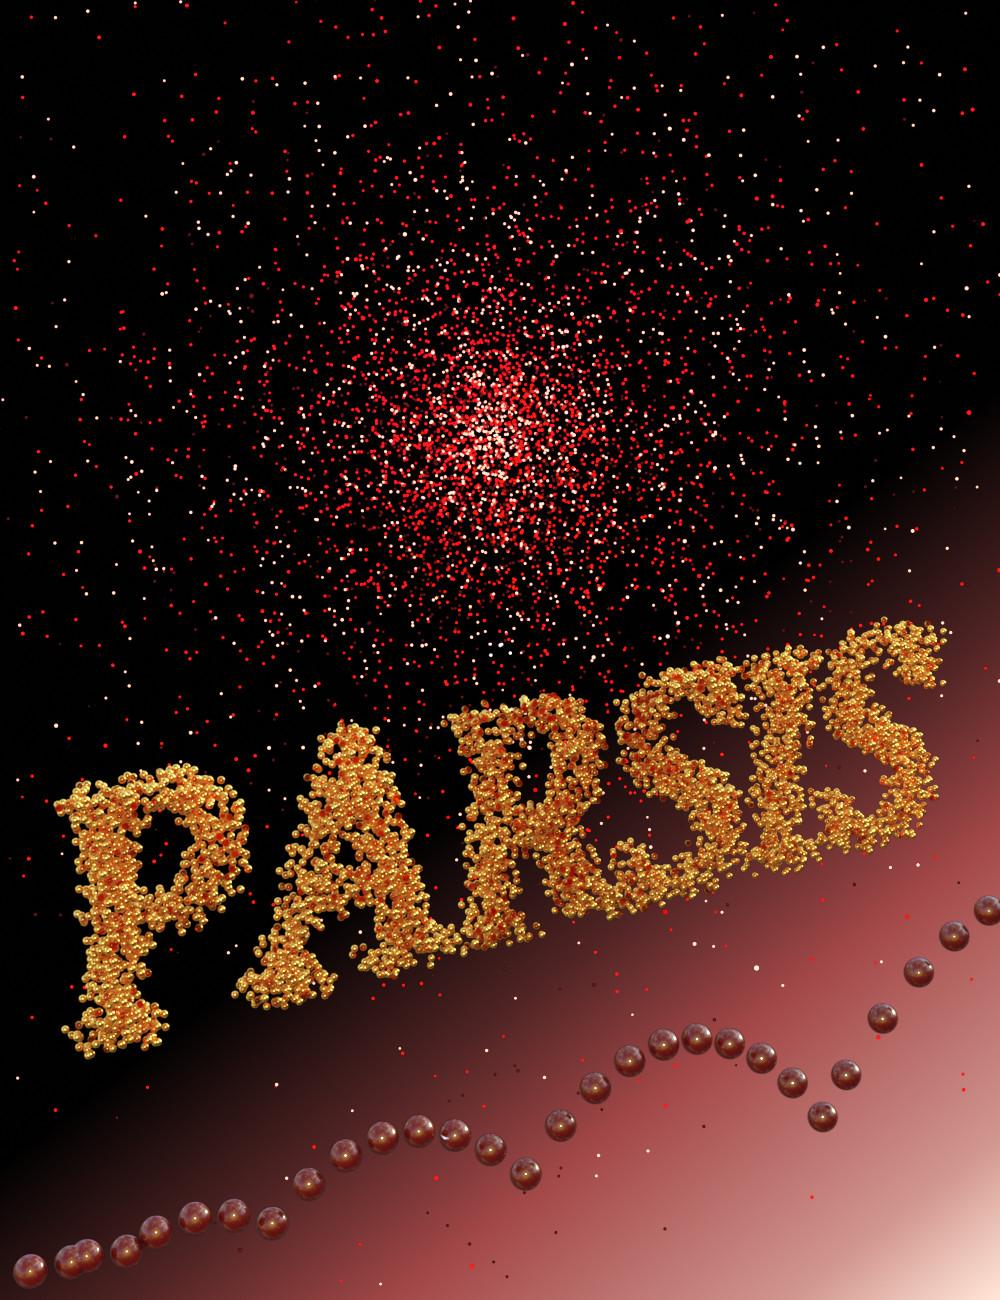 PARSIS: A Particles System by: Alvin Bemar, 3D Models by Daz 3D